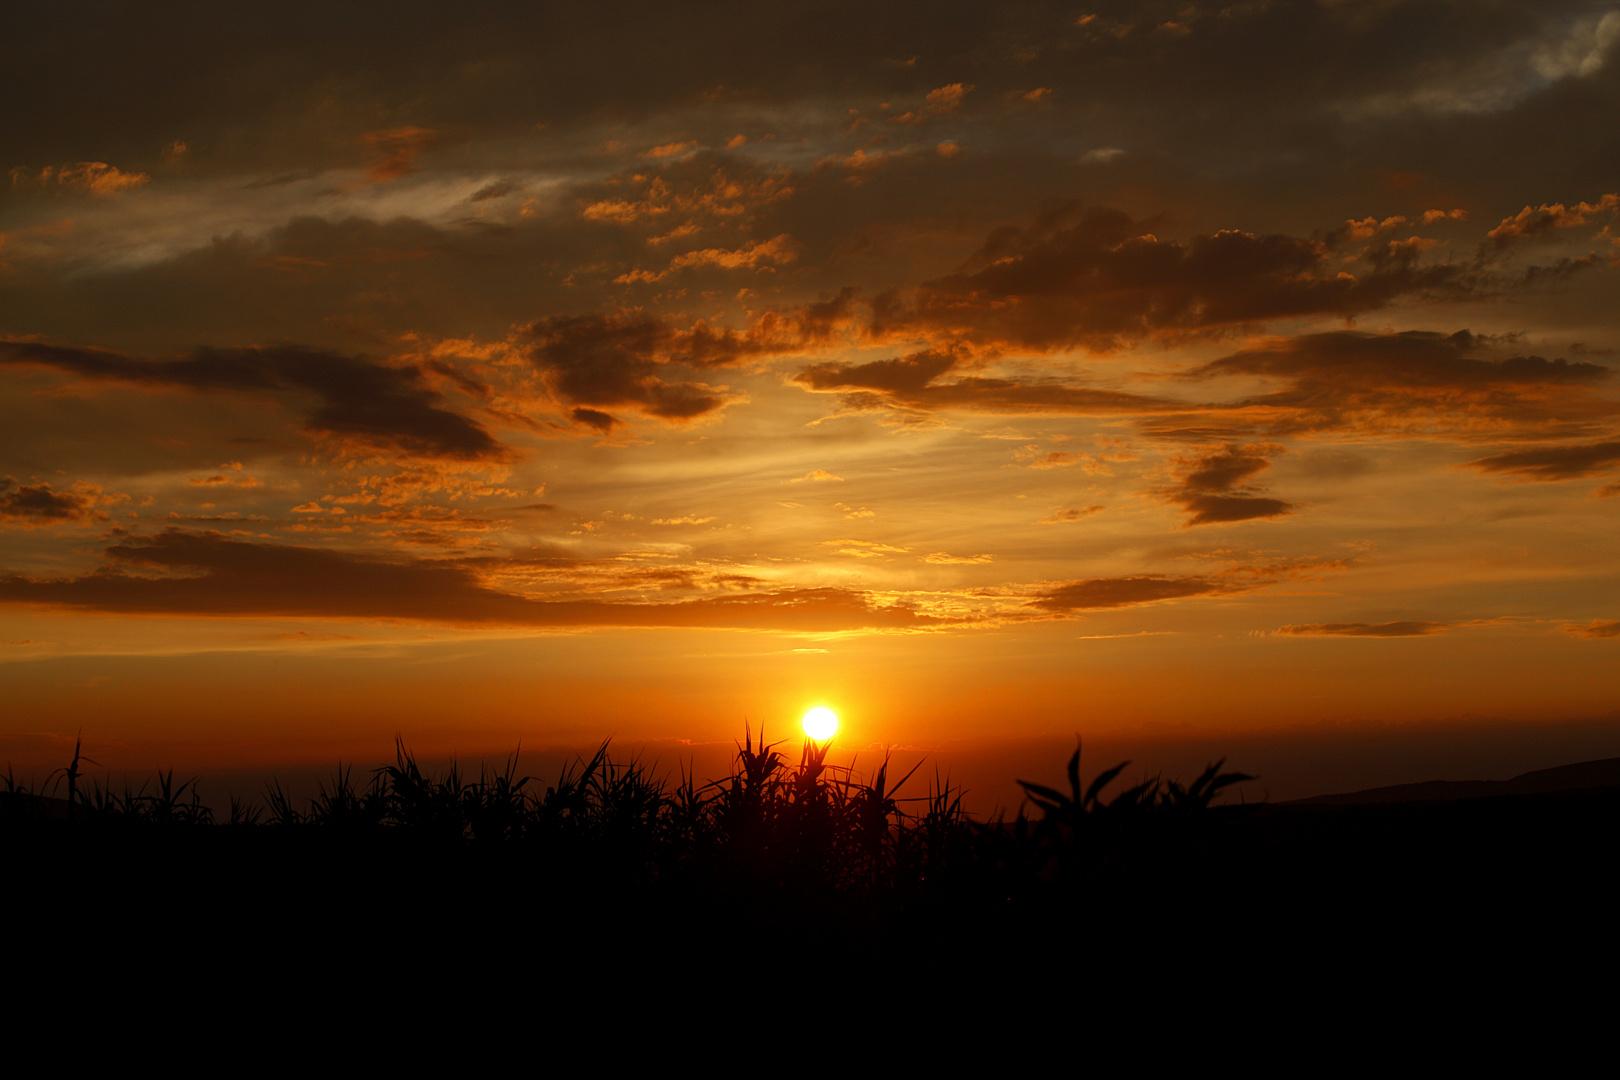 Sonnenuntergang in der Provence (2)